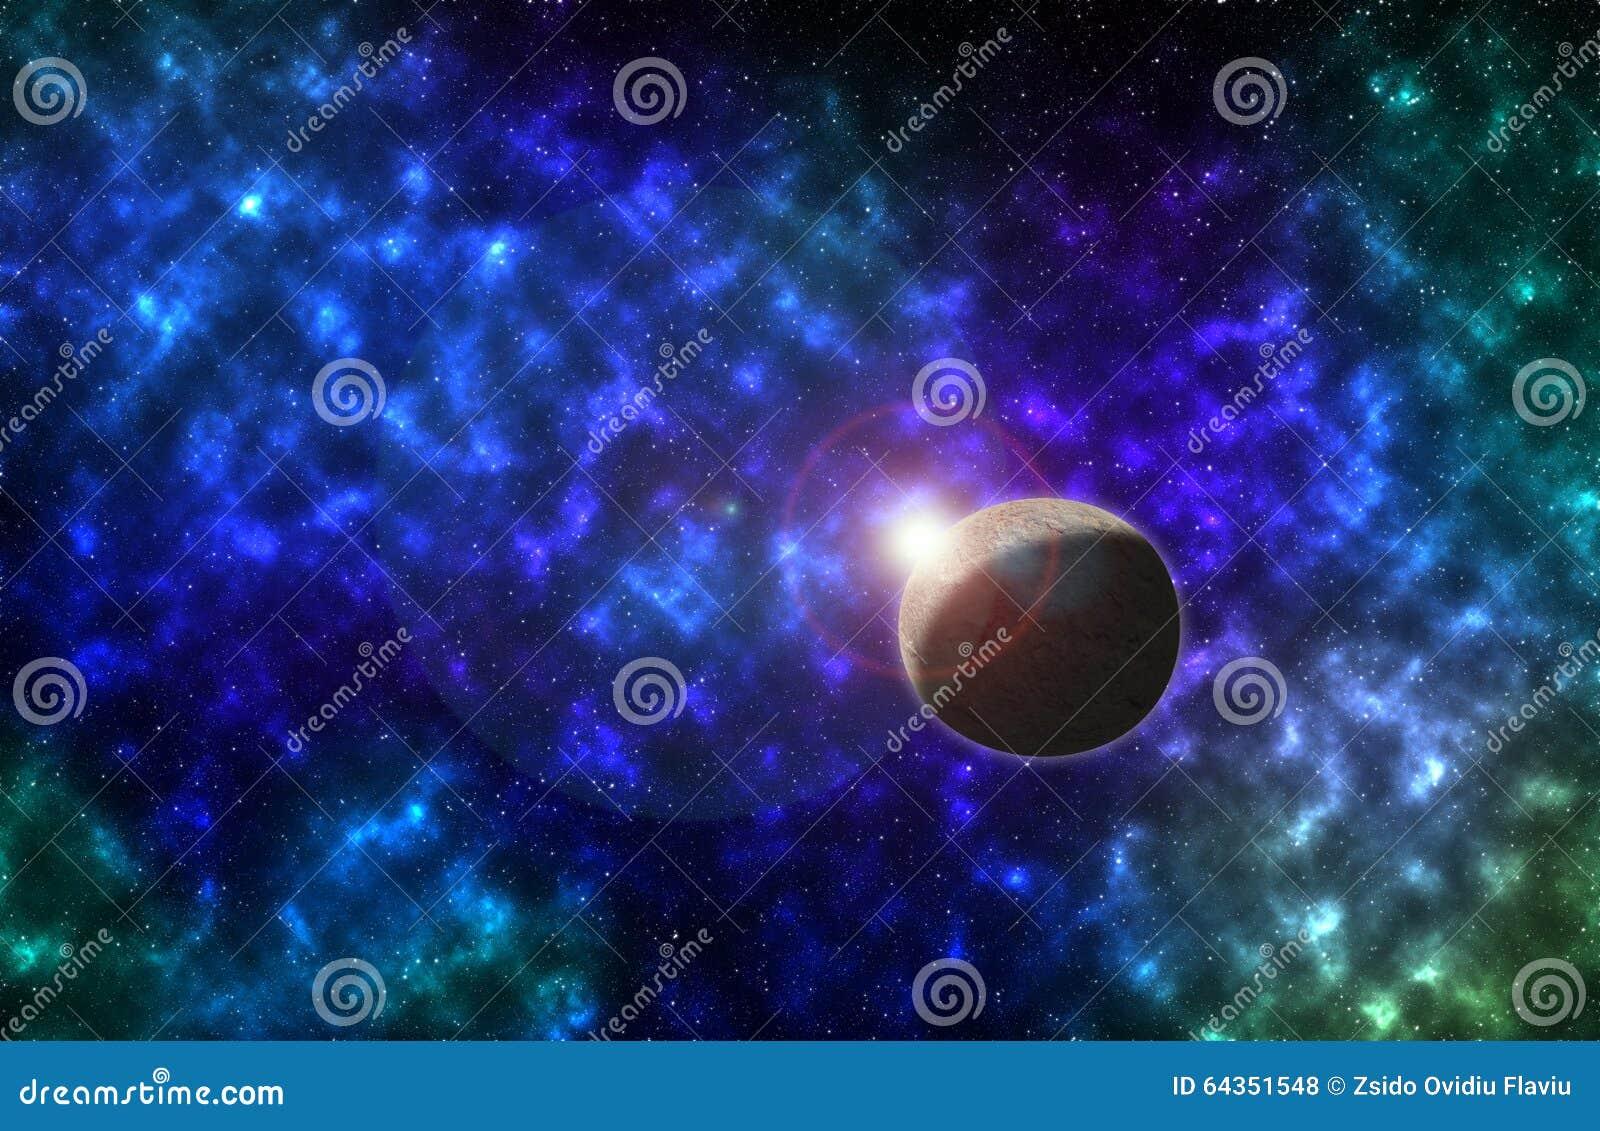 galaxies stars and moon - photo #22